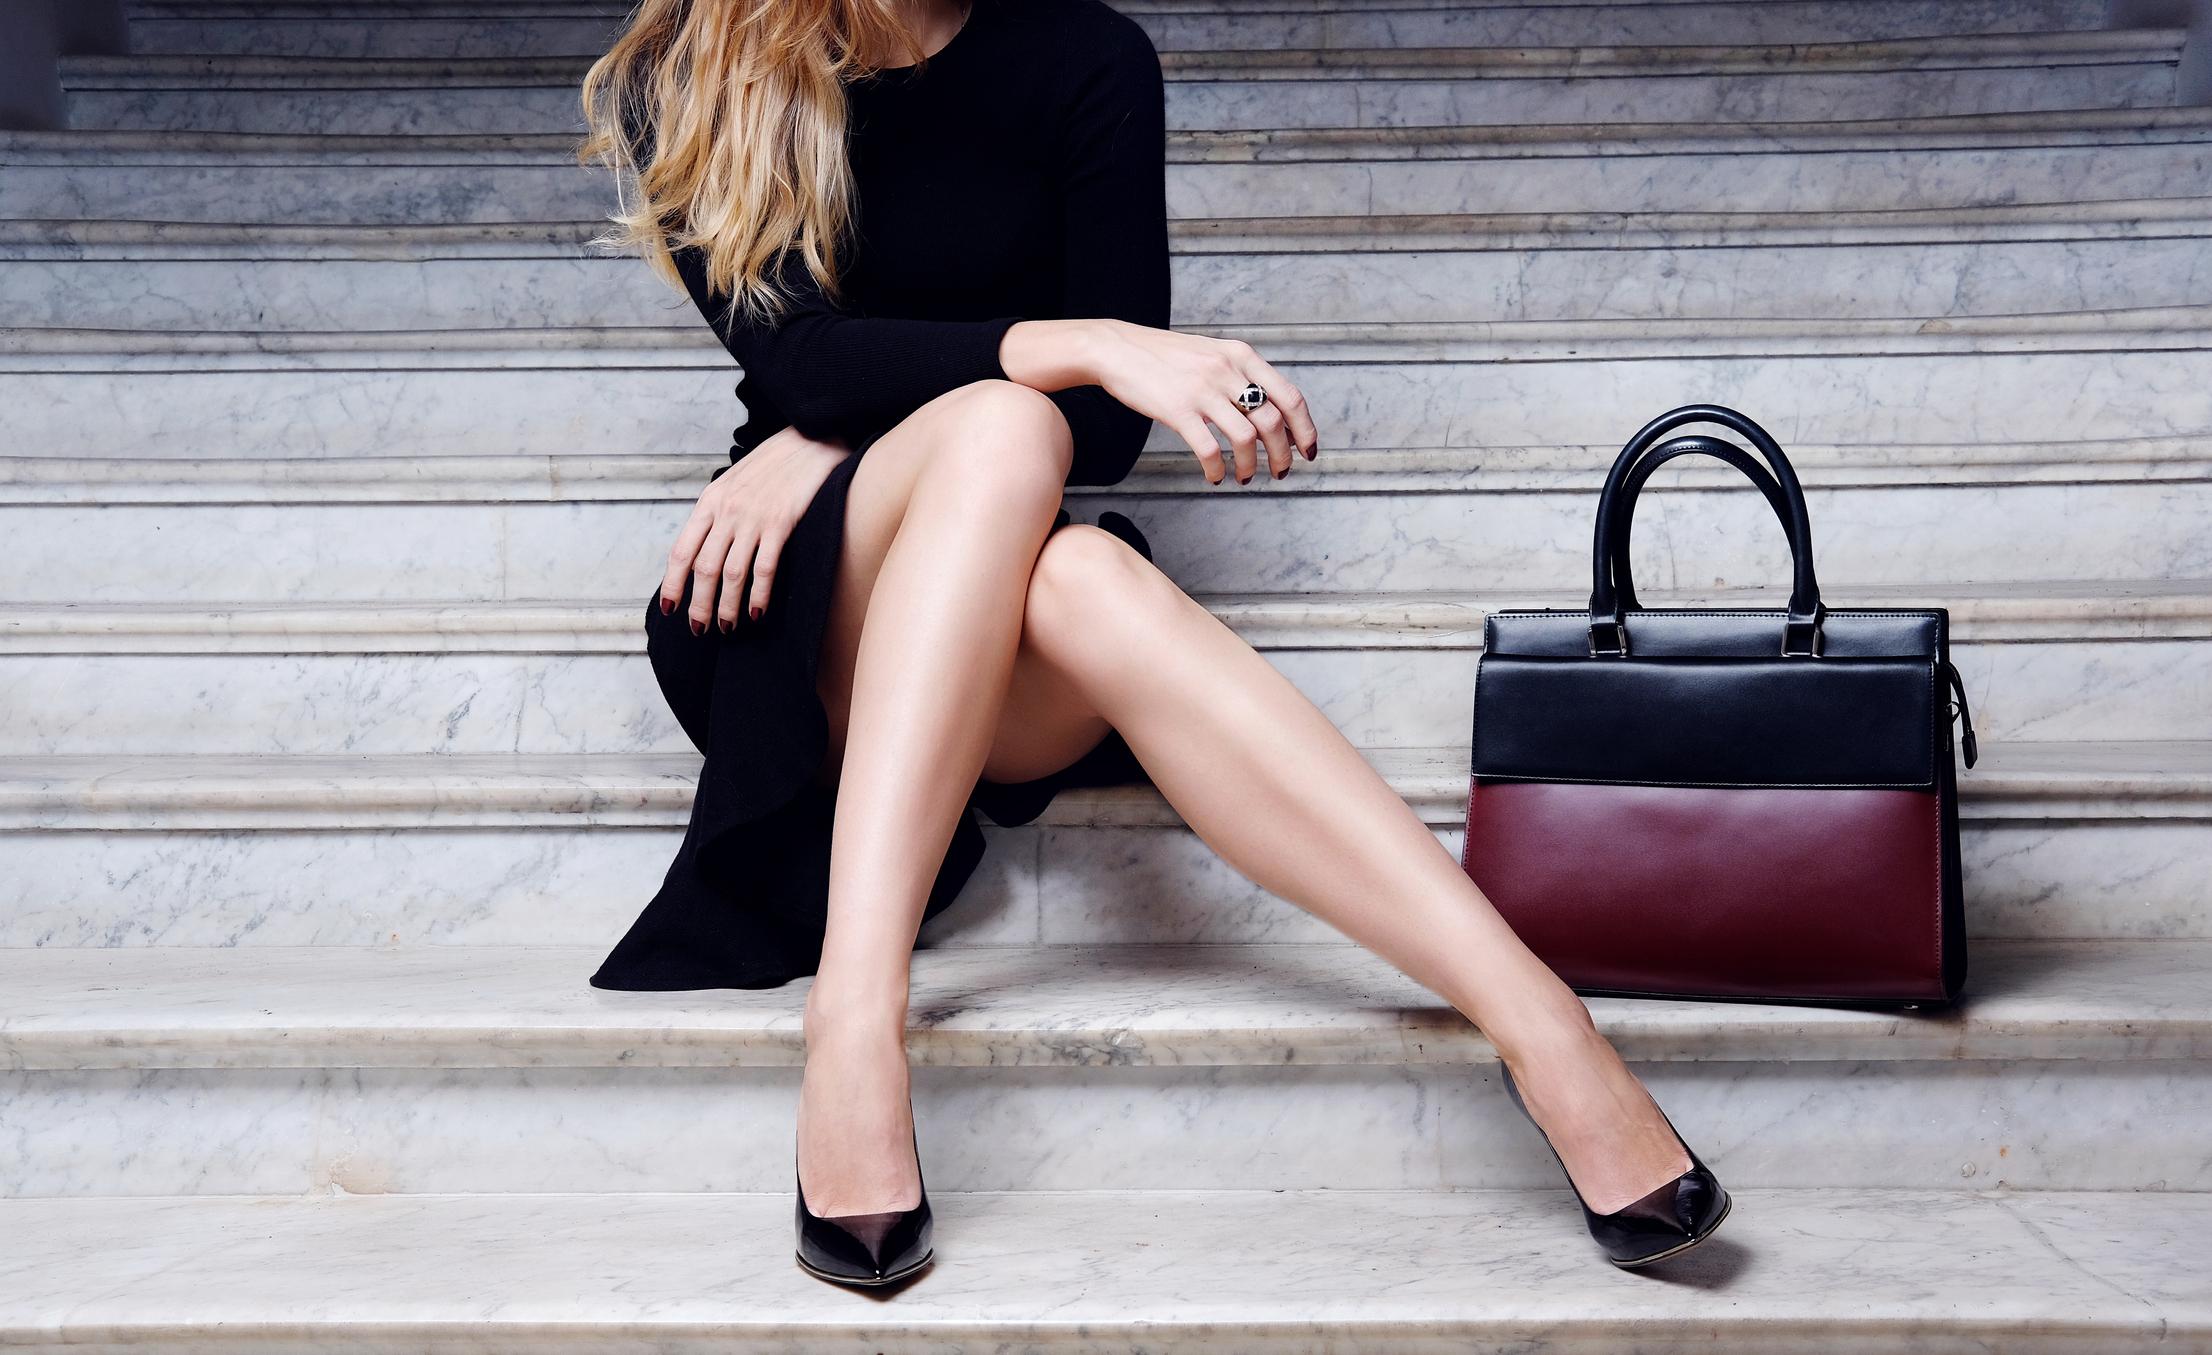 Woman sitting on steps next to luxury handbag.